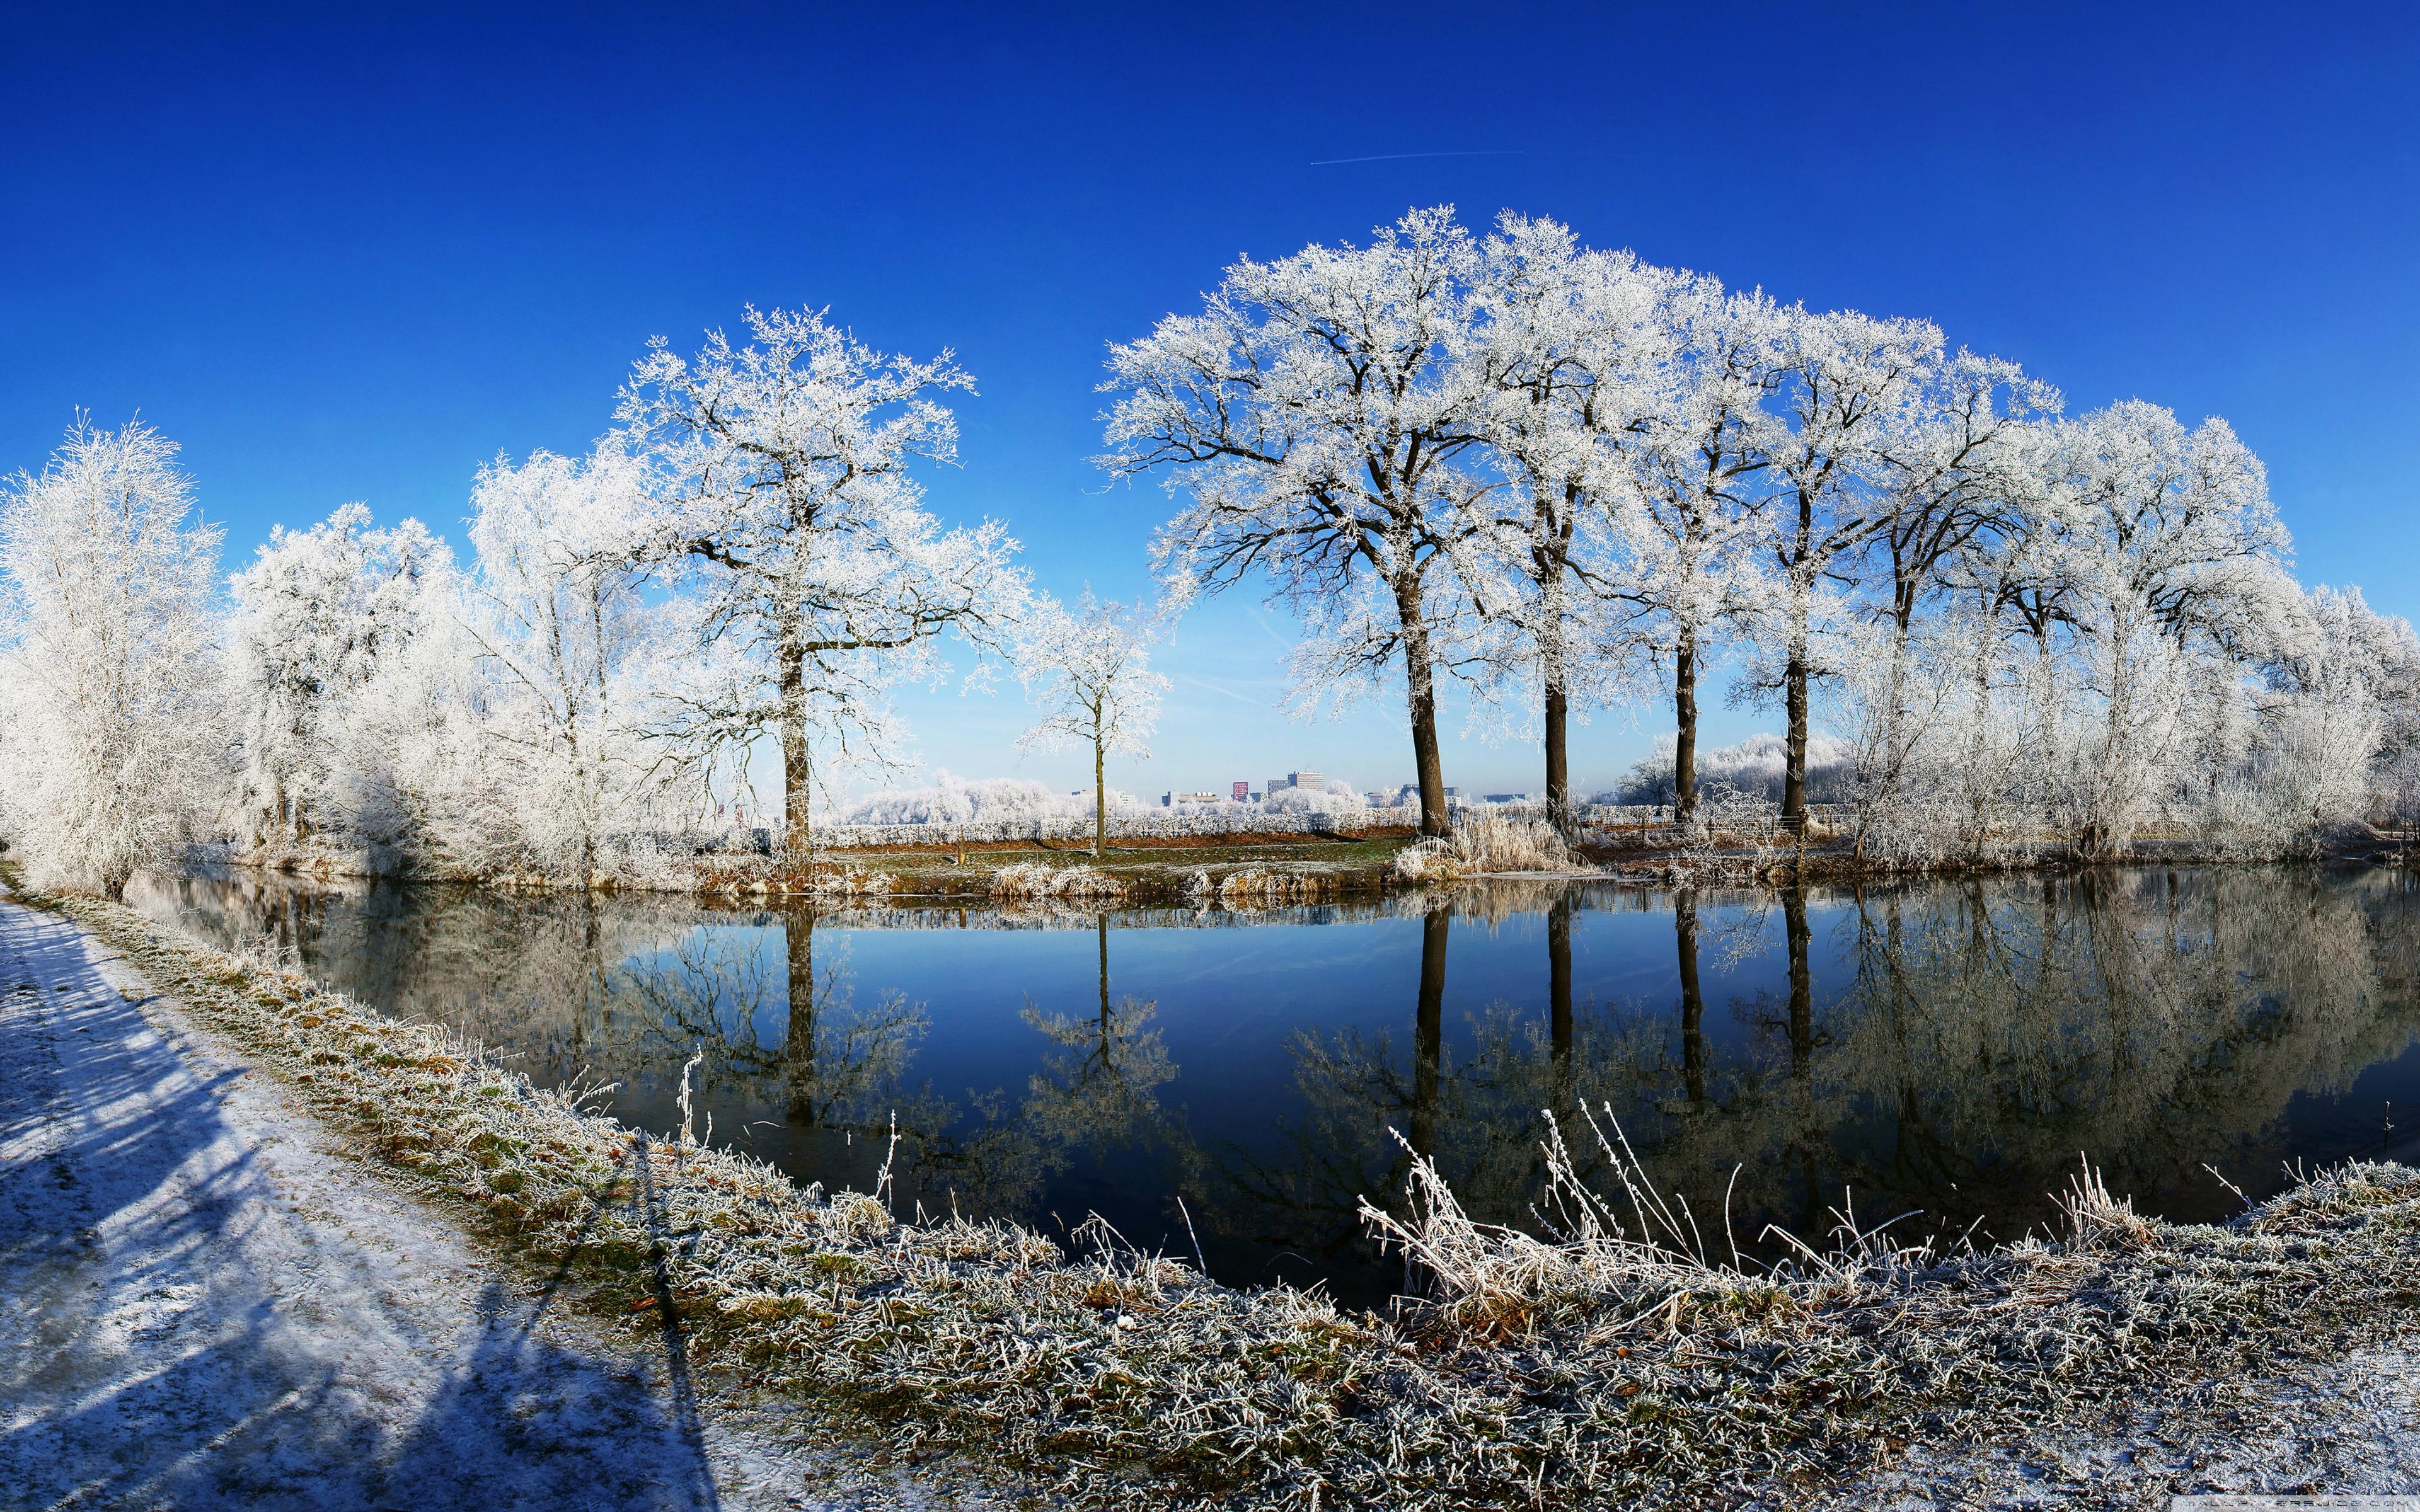 Crooked Rhine River Fisheye Photography 4K HD Desktop Wallpaper 3840x2400